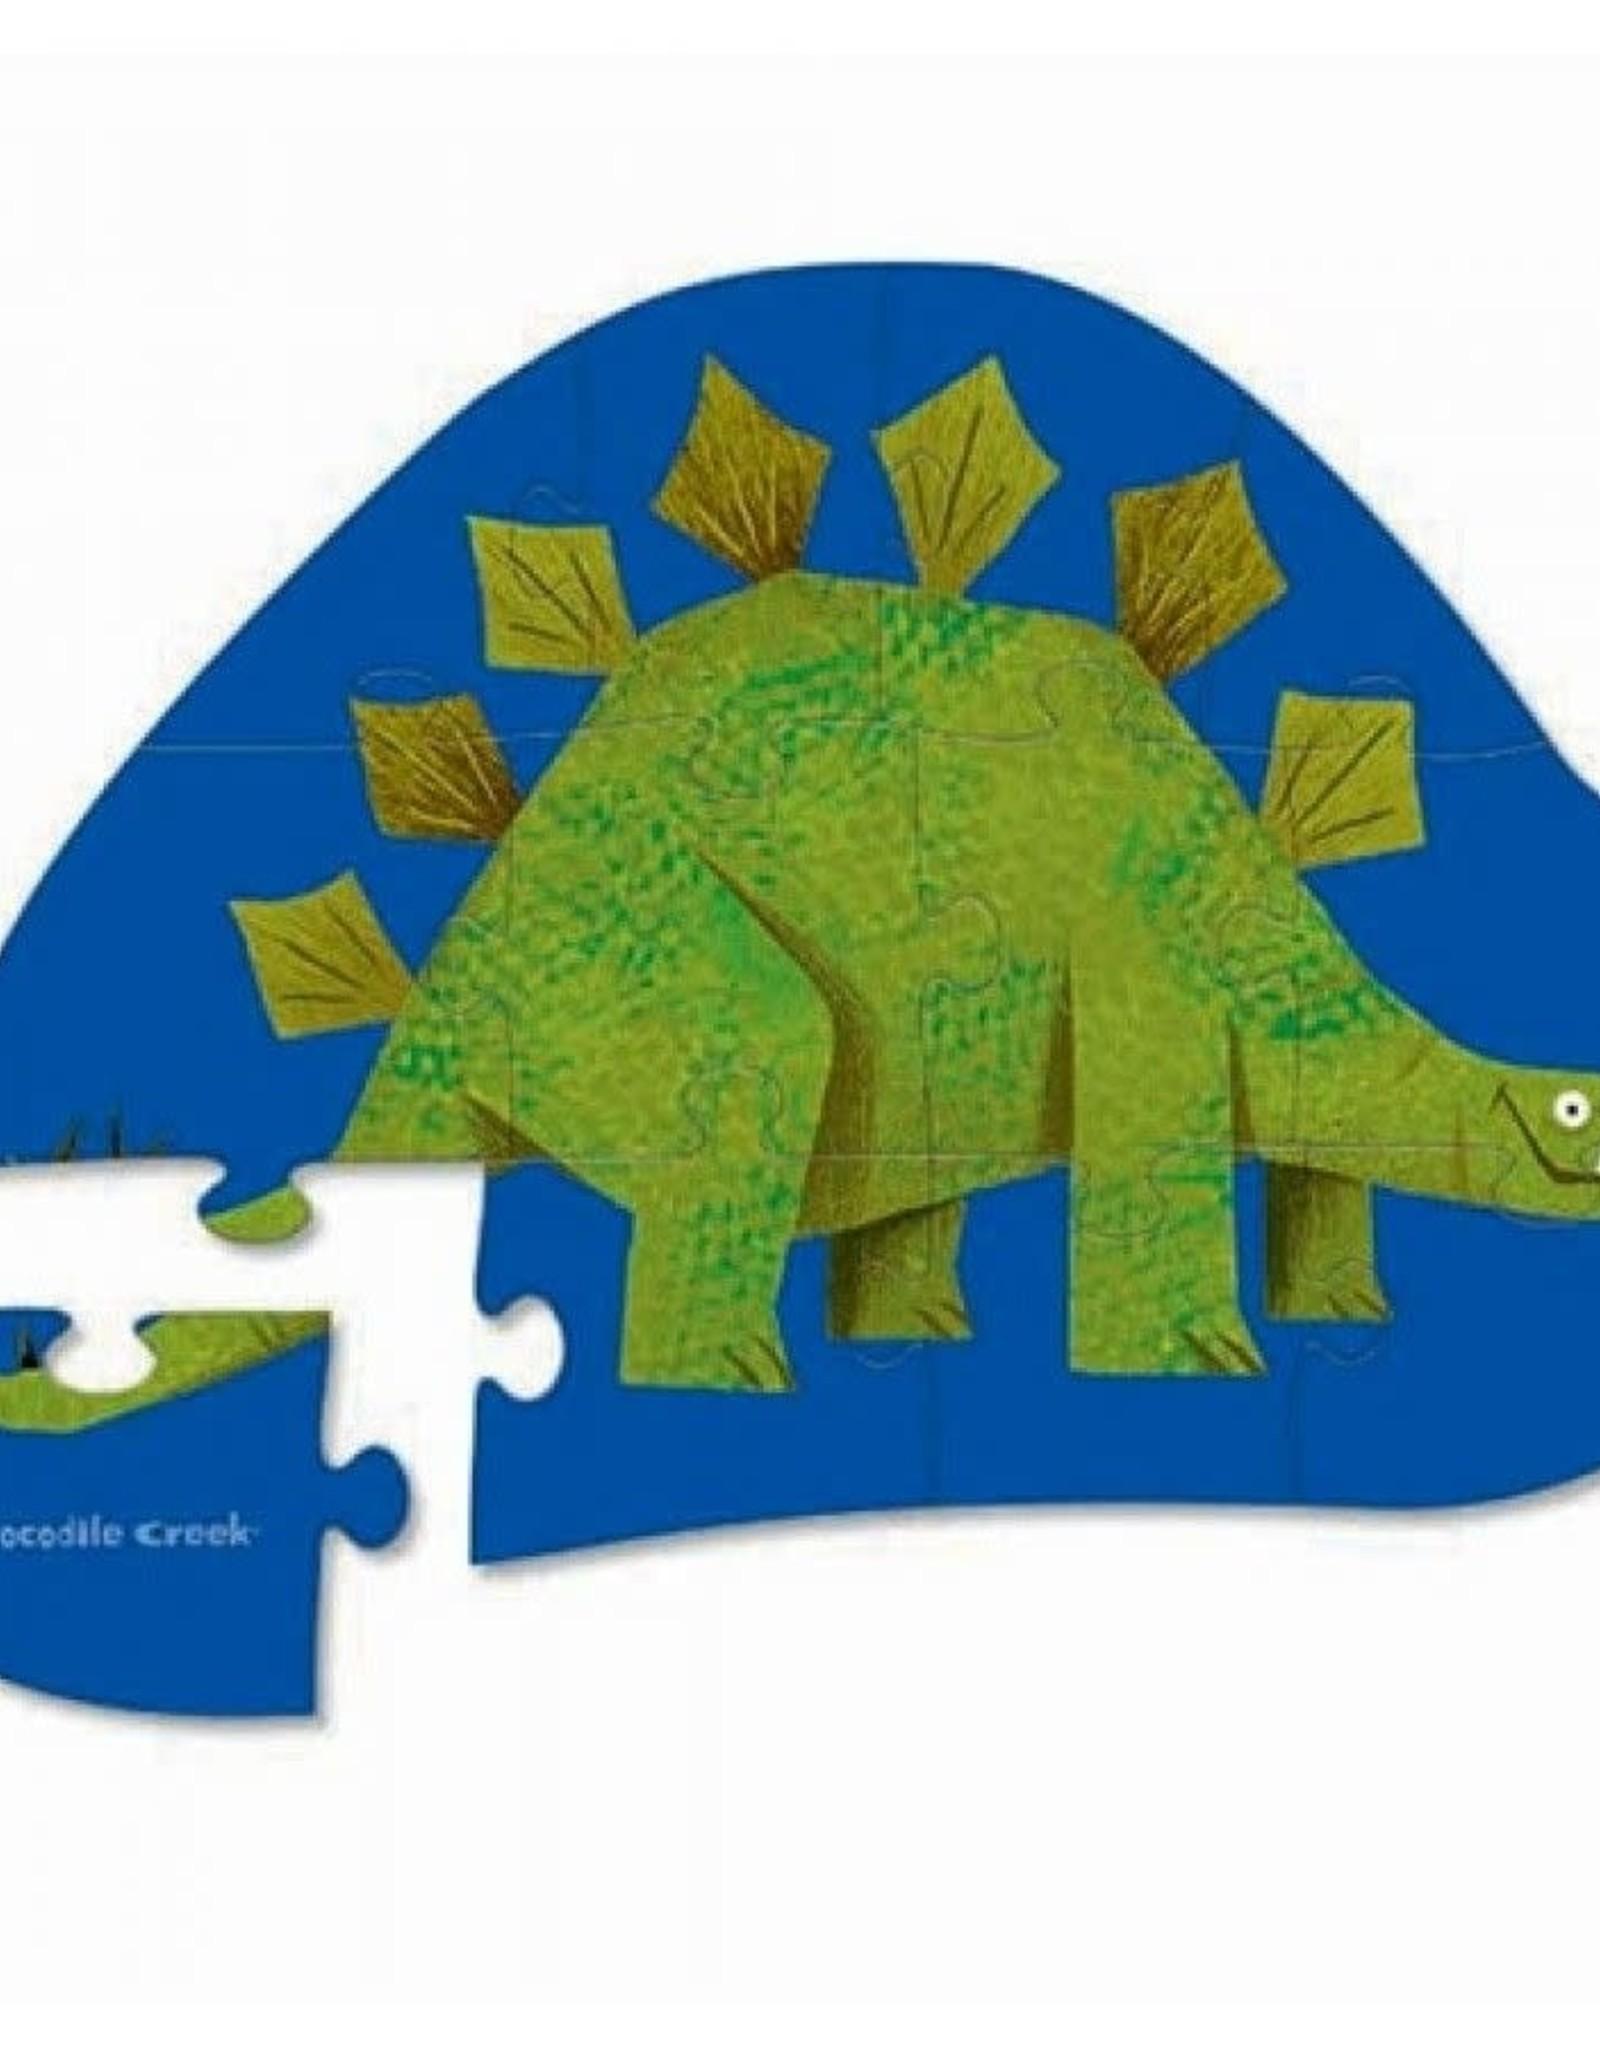 Crocodile Creek Minipuzzel Stegosaurus 12st.